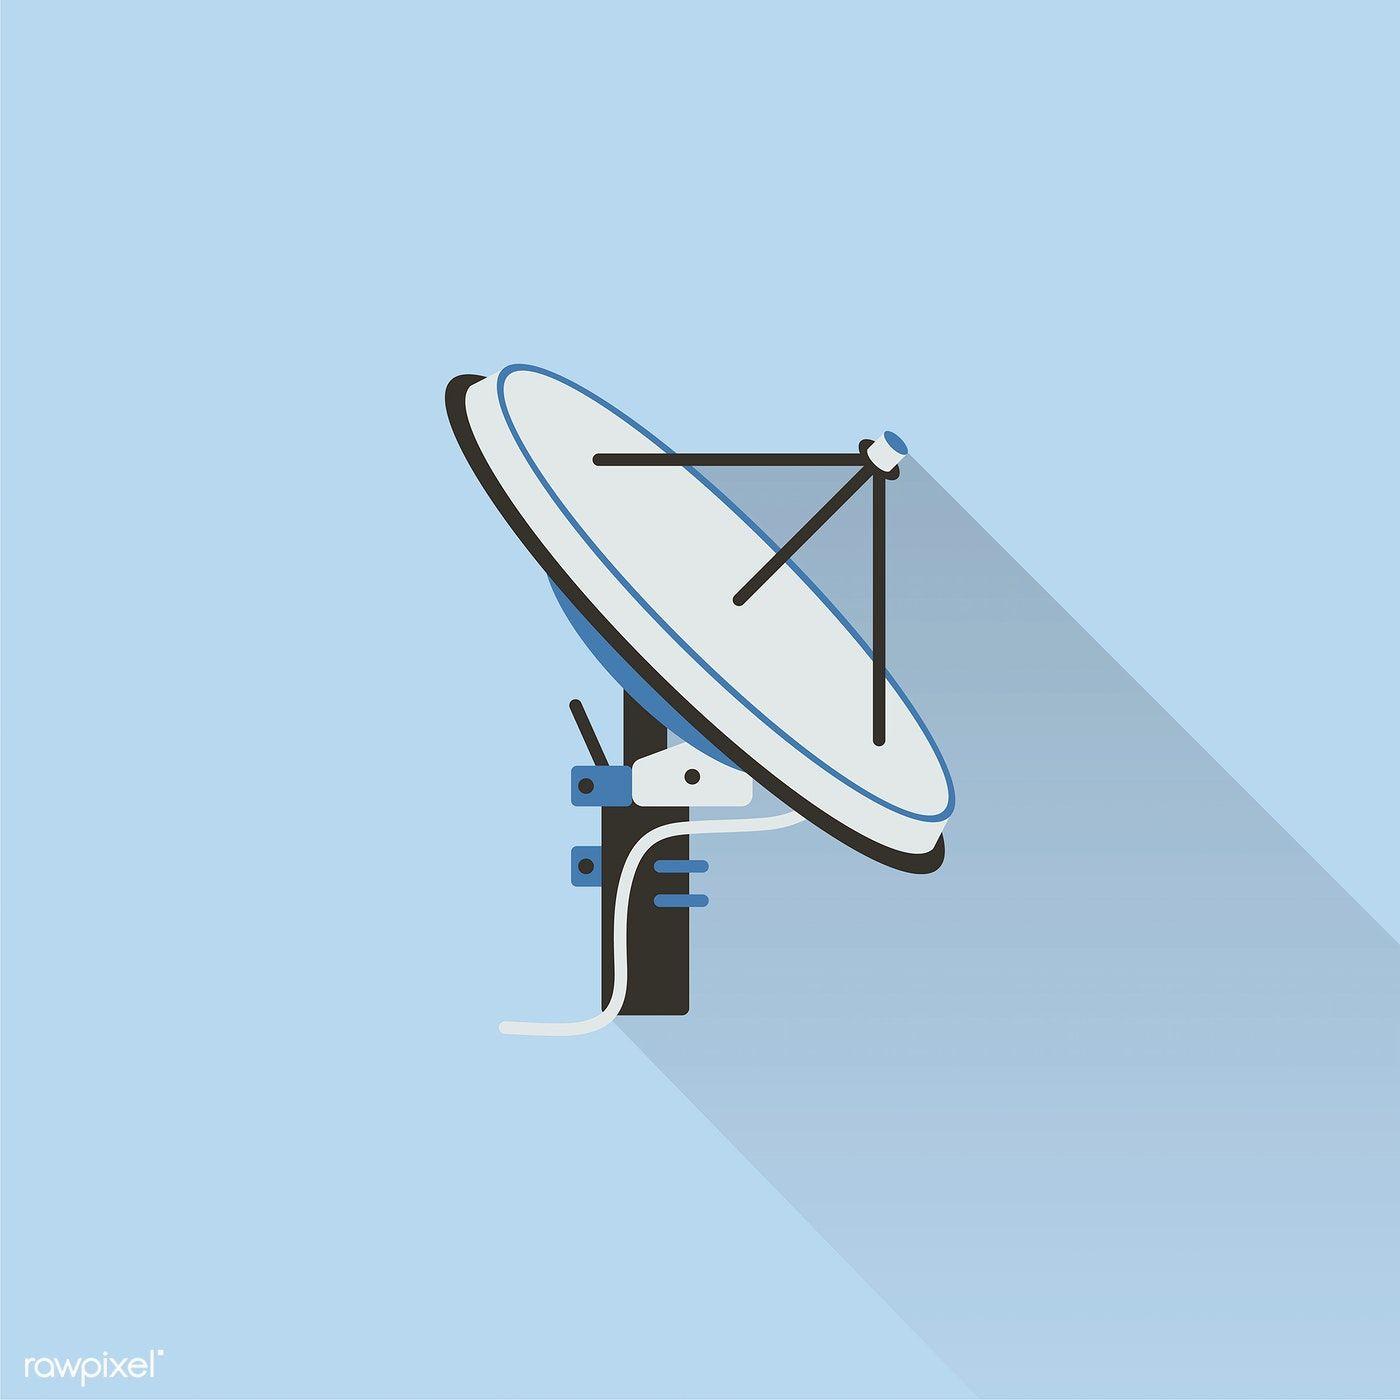 Illustration Of Satellite Antenna Free Image By Rawpixel Com Ningzk V Satellite Illustration Satellite Antenna Illustration